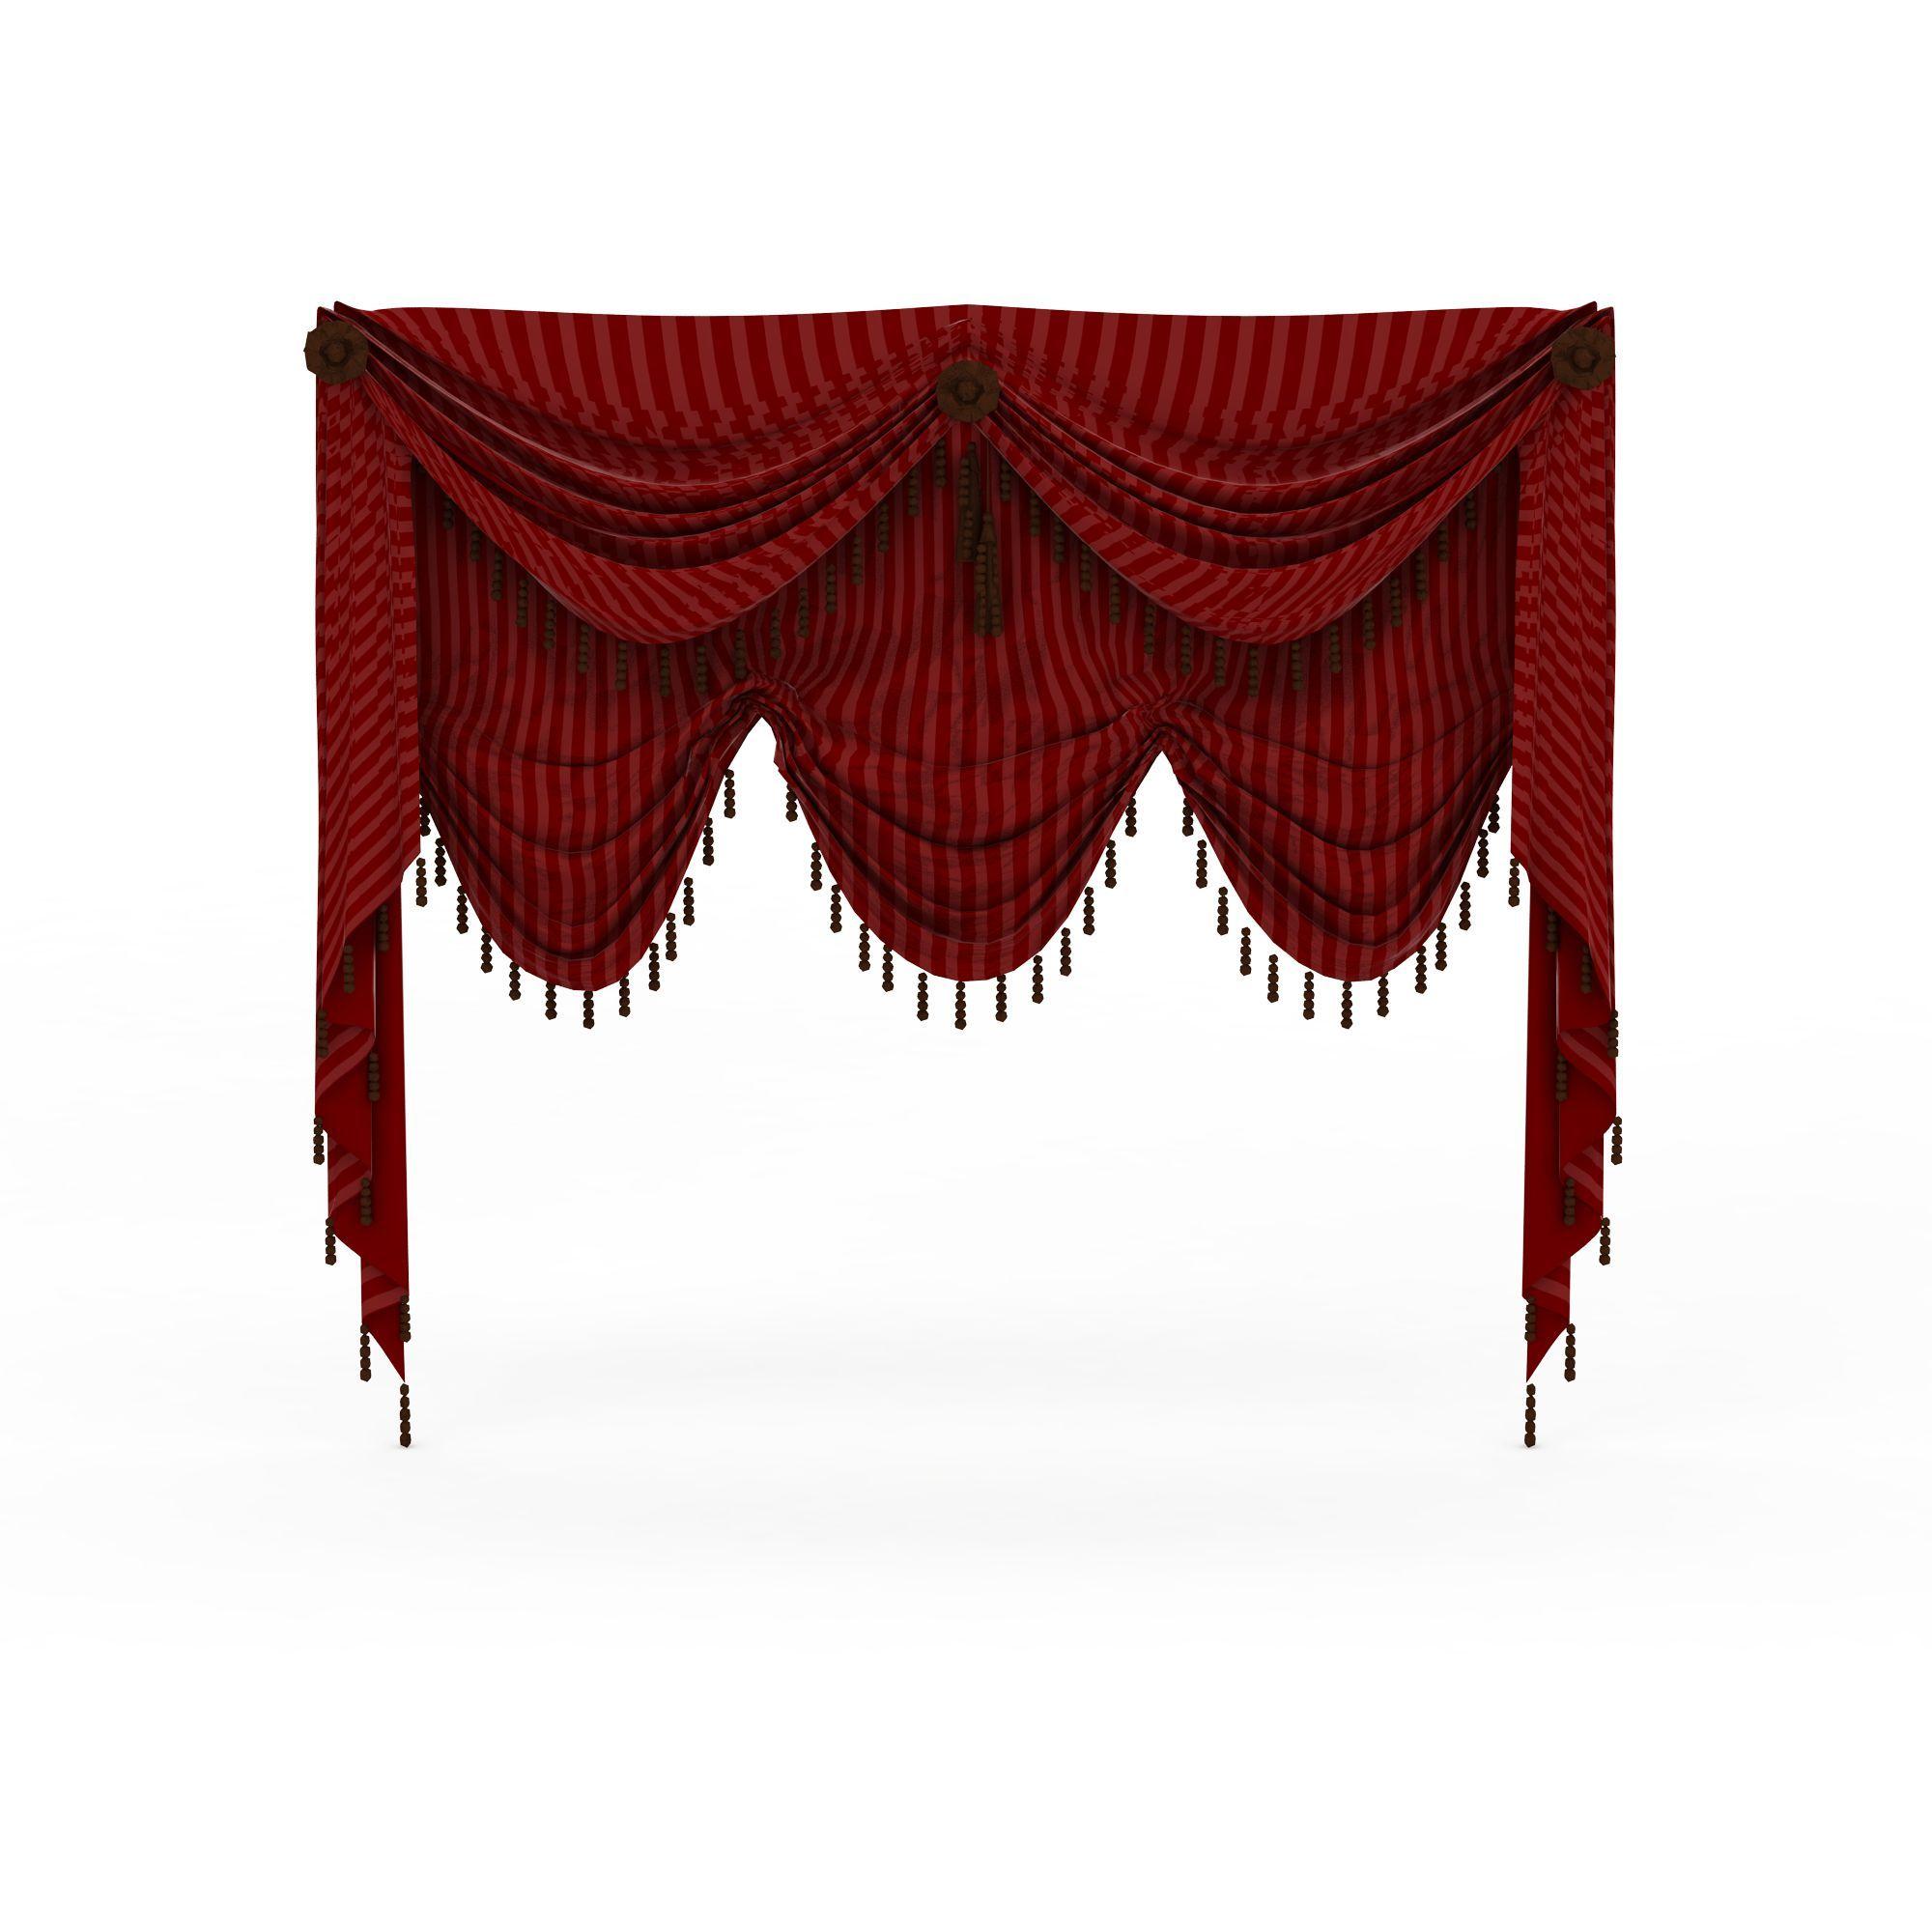 png 风格 欧式 上传时间 2015/03/04  关键词:高档欧式窗帘3d模型红色